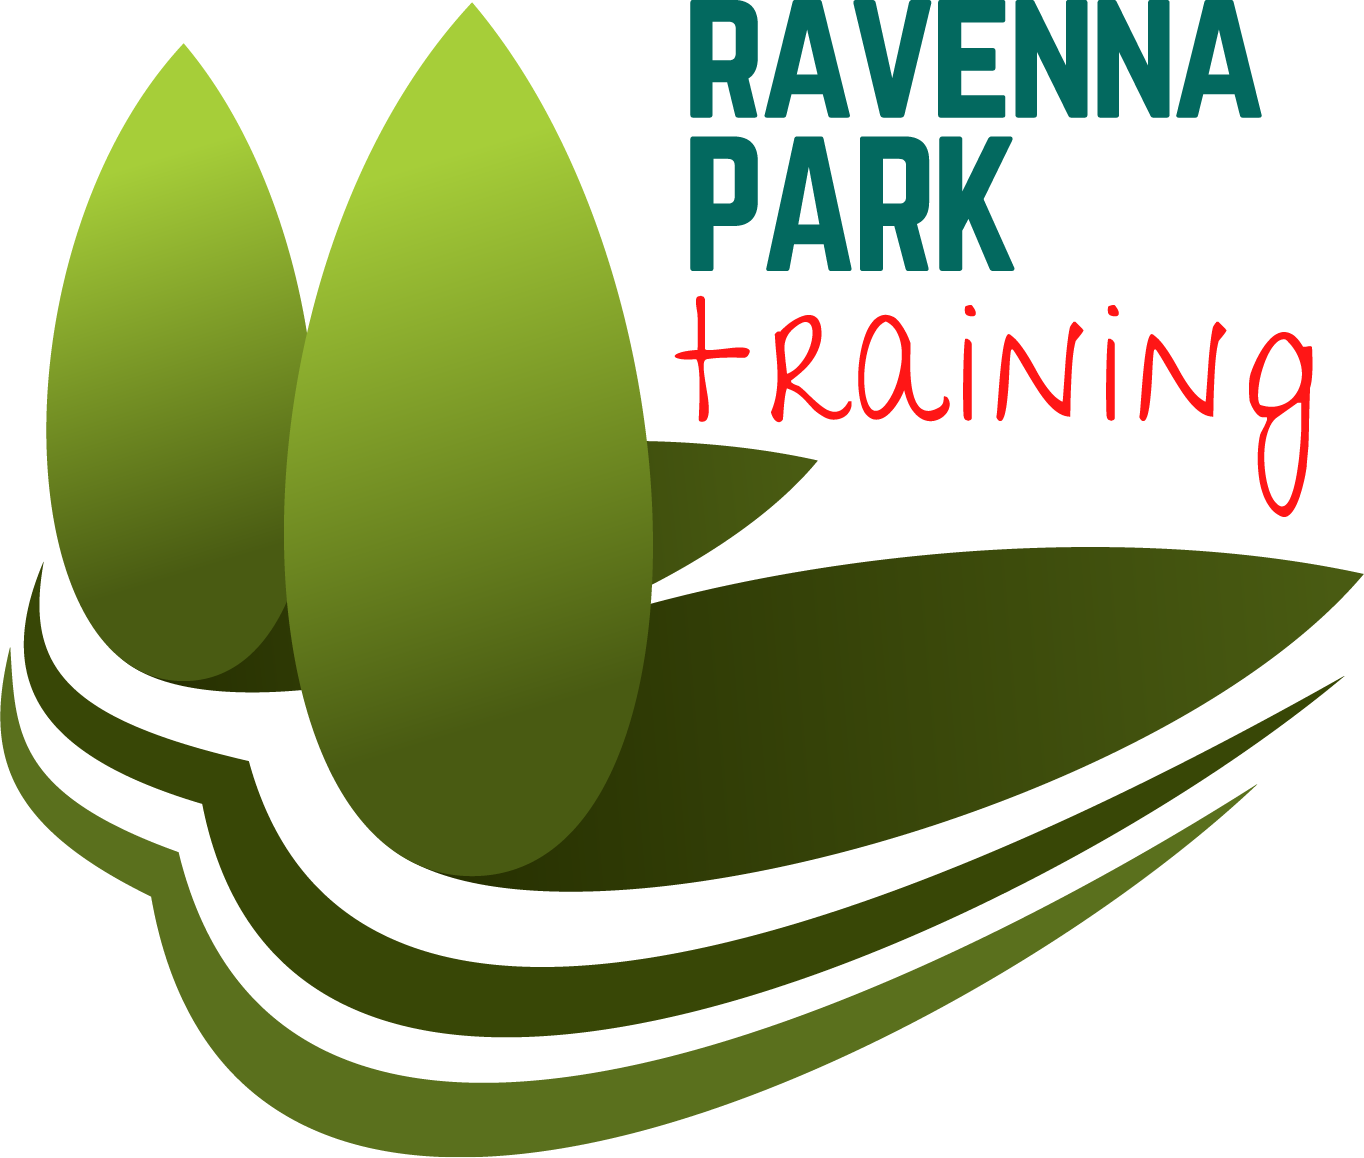 Ravenna Park Training.Small